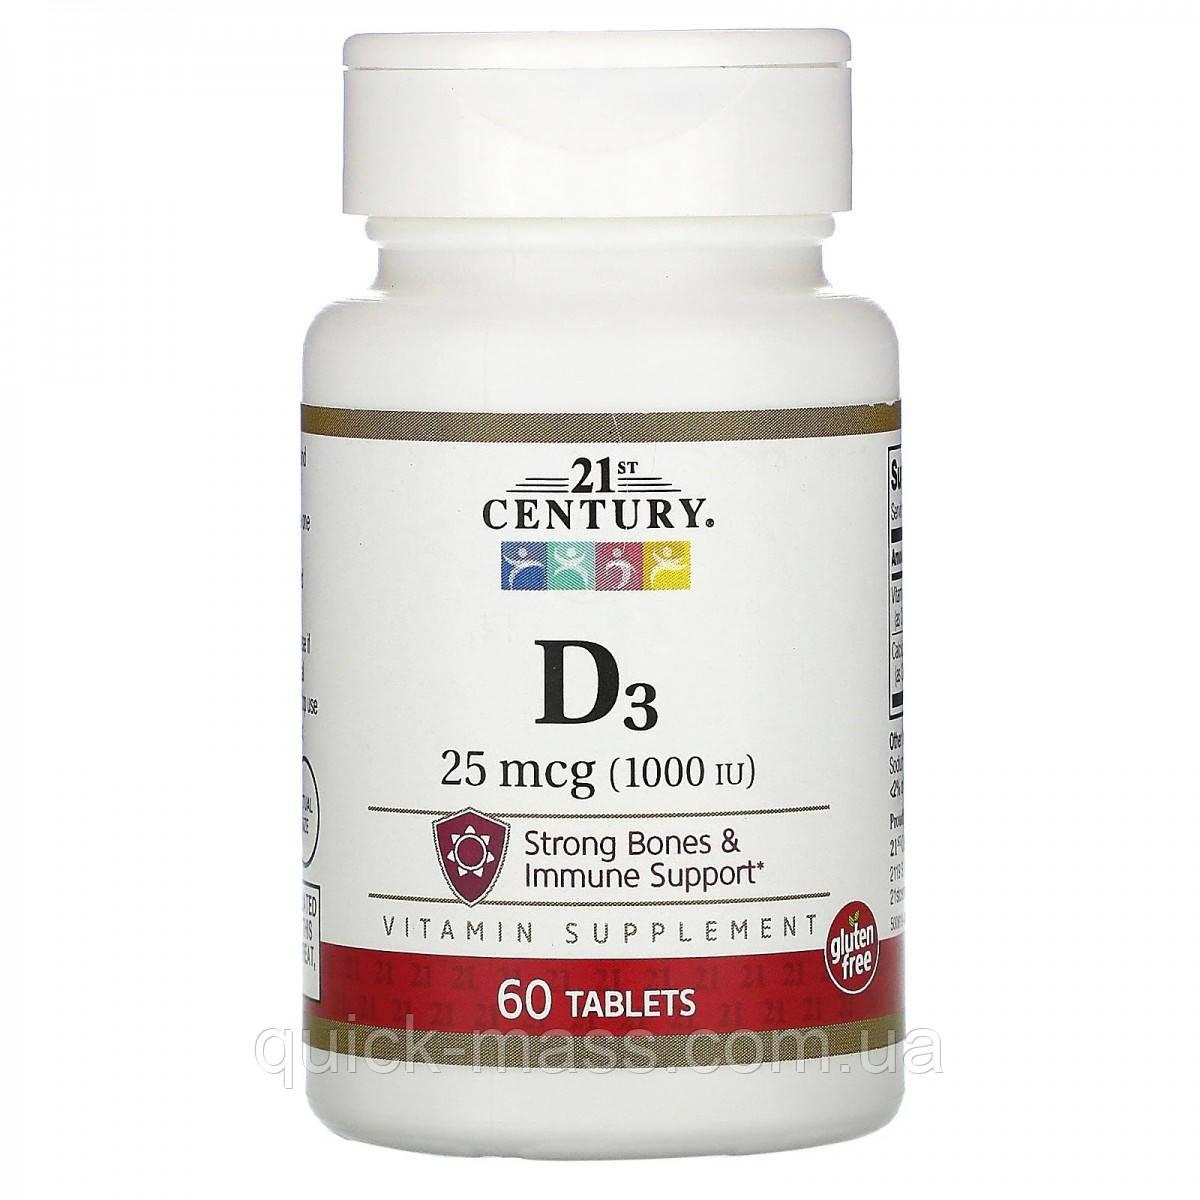 Витамин D3 1000IU 21st Century Vitamin D3 60tab